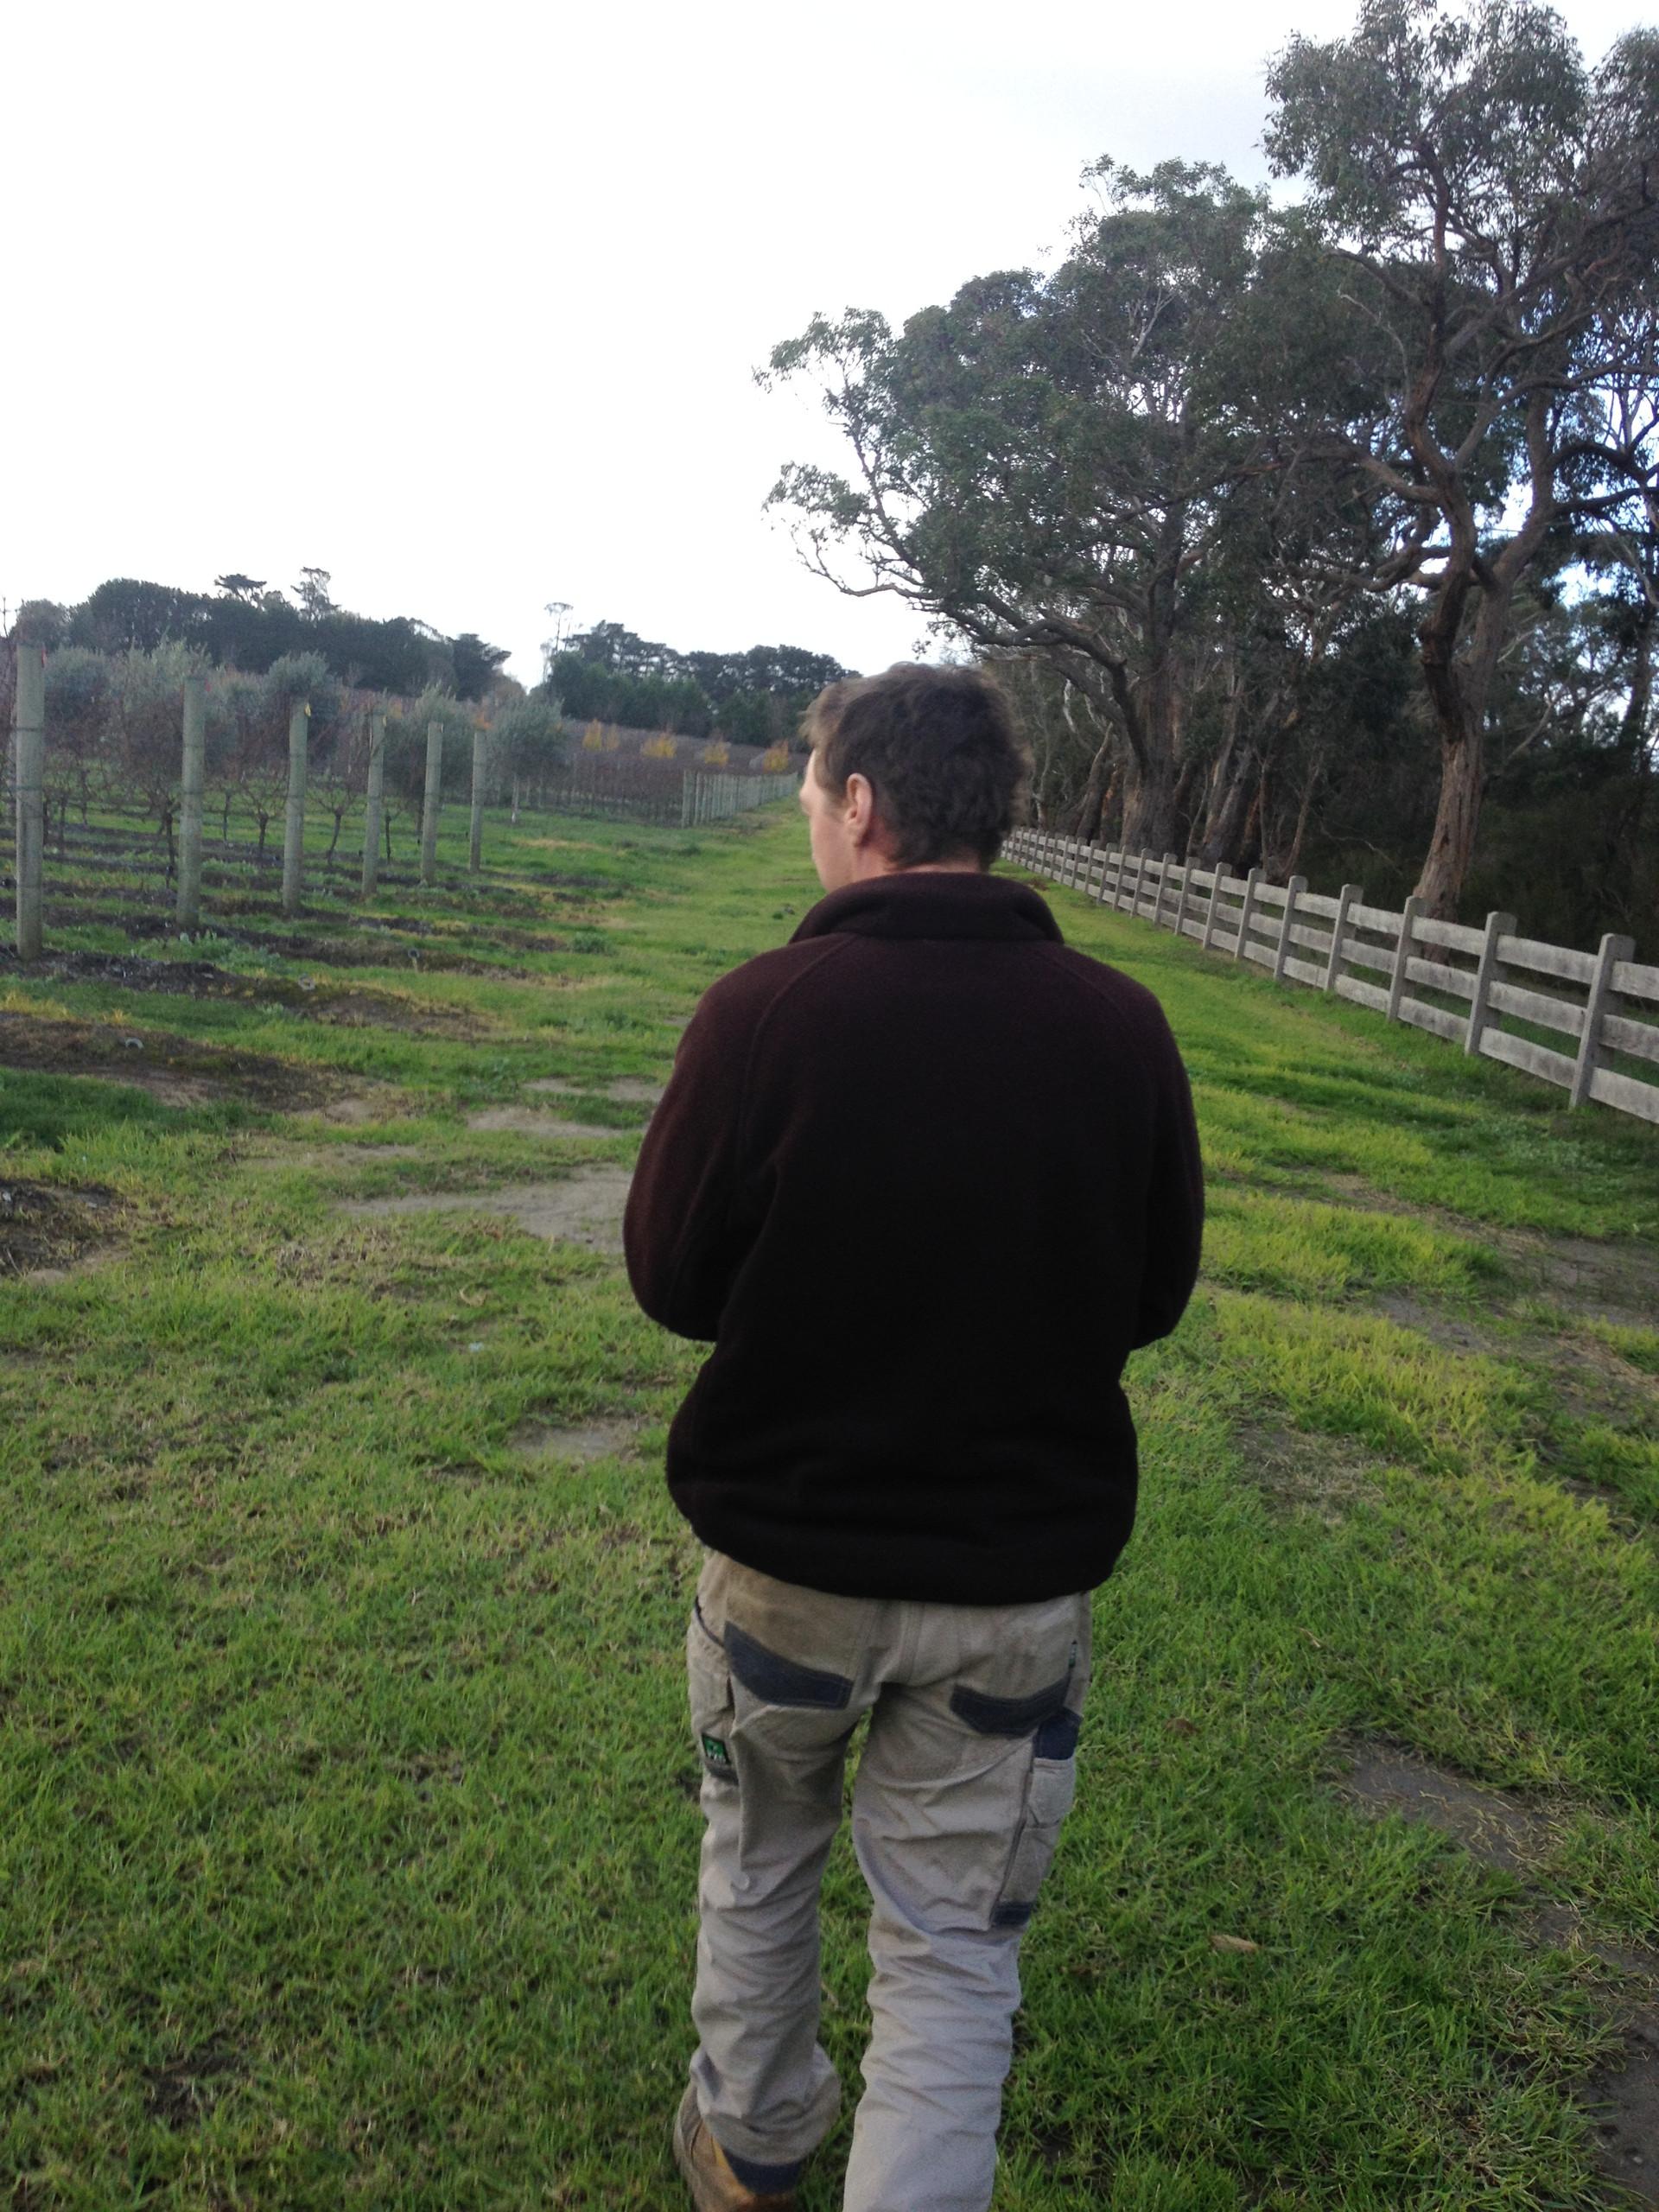 Tour with viticulturist on the Mornington Peninsula